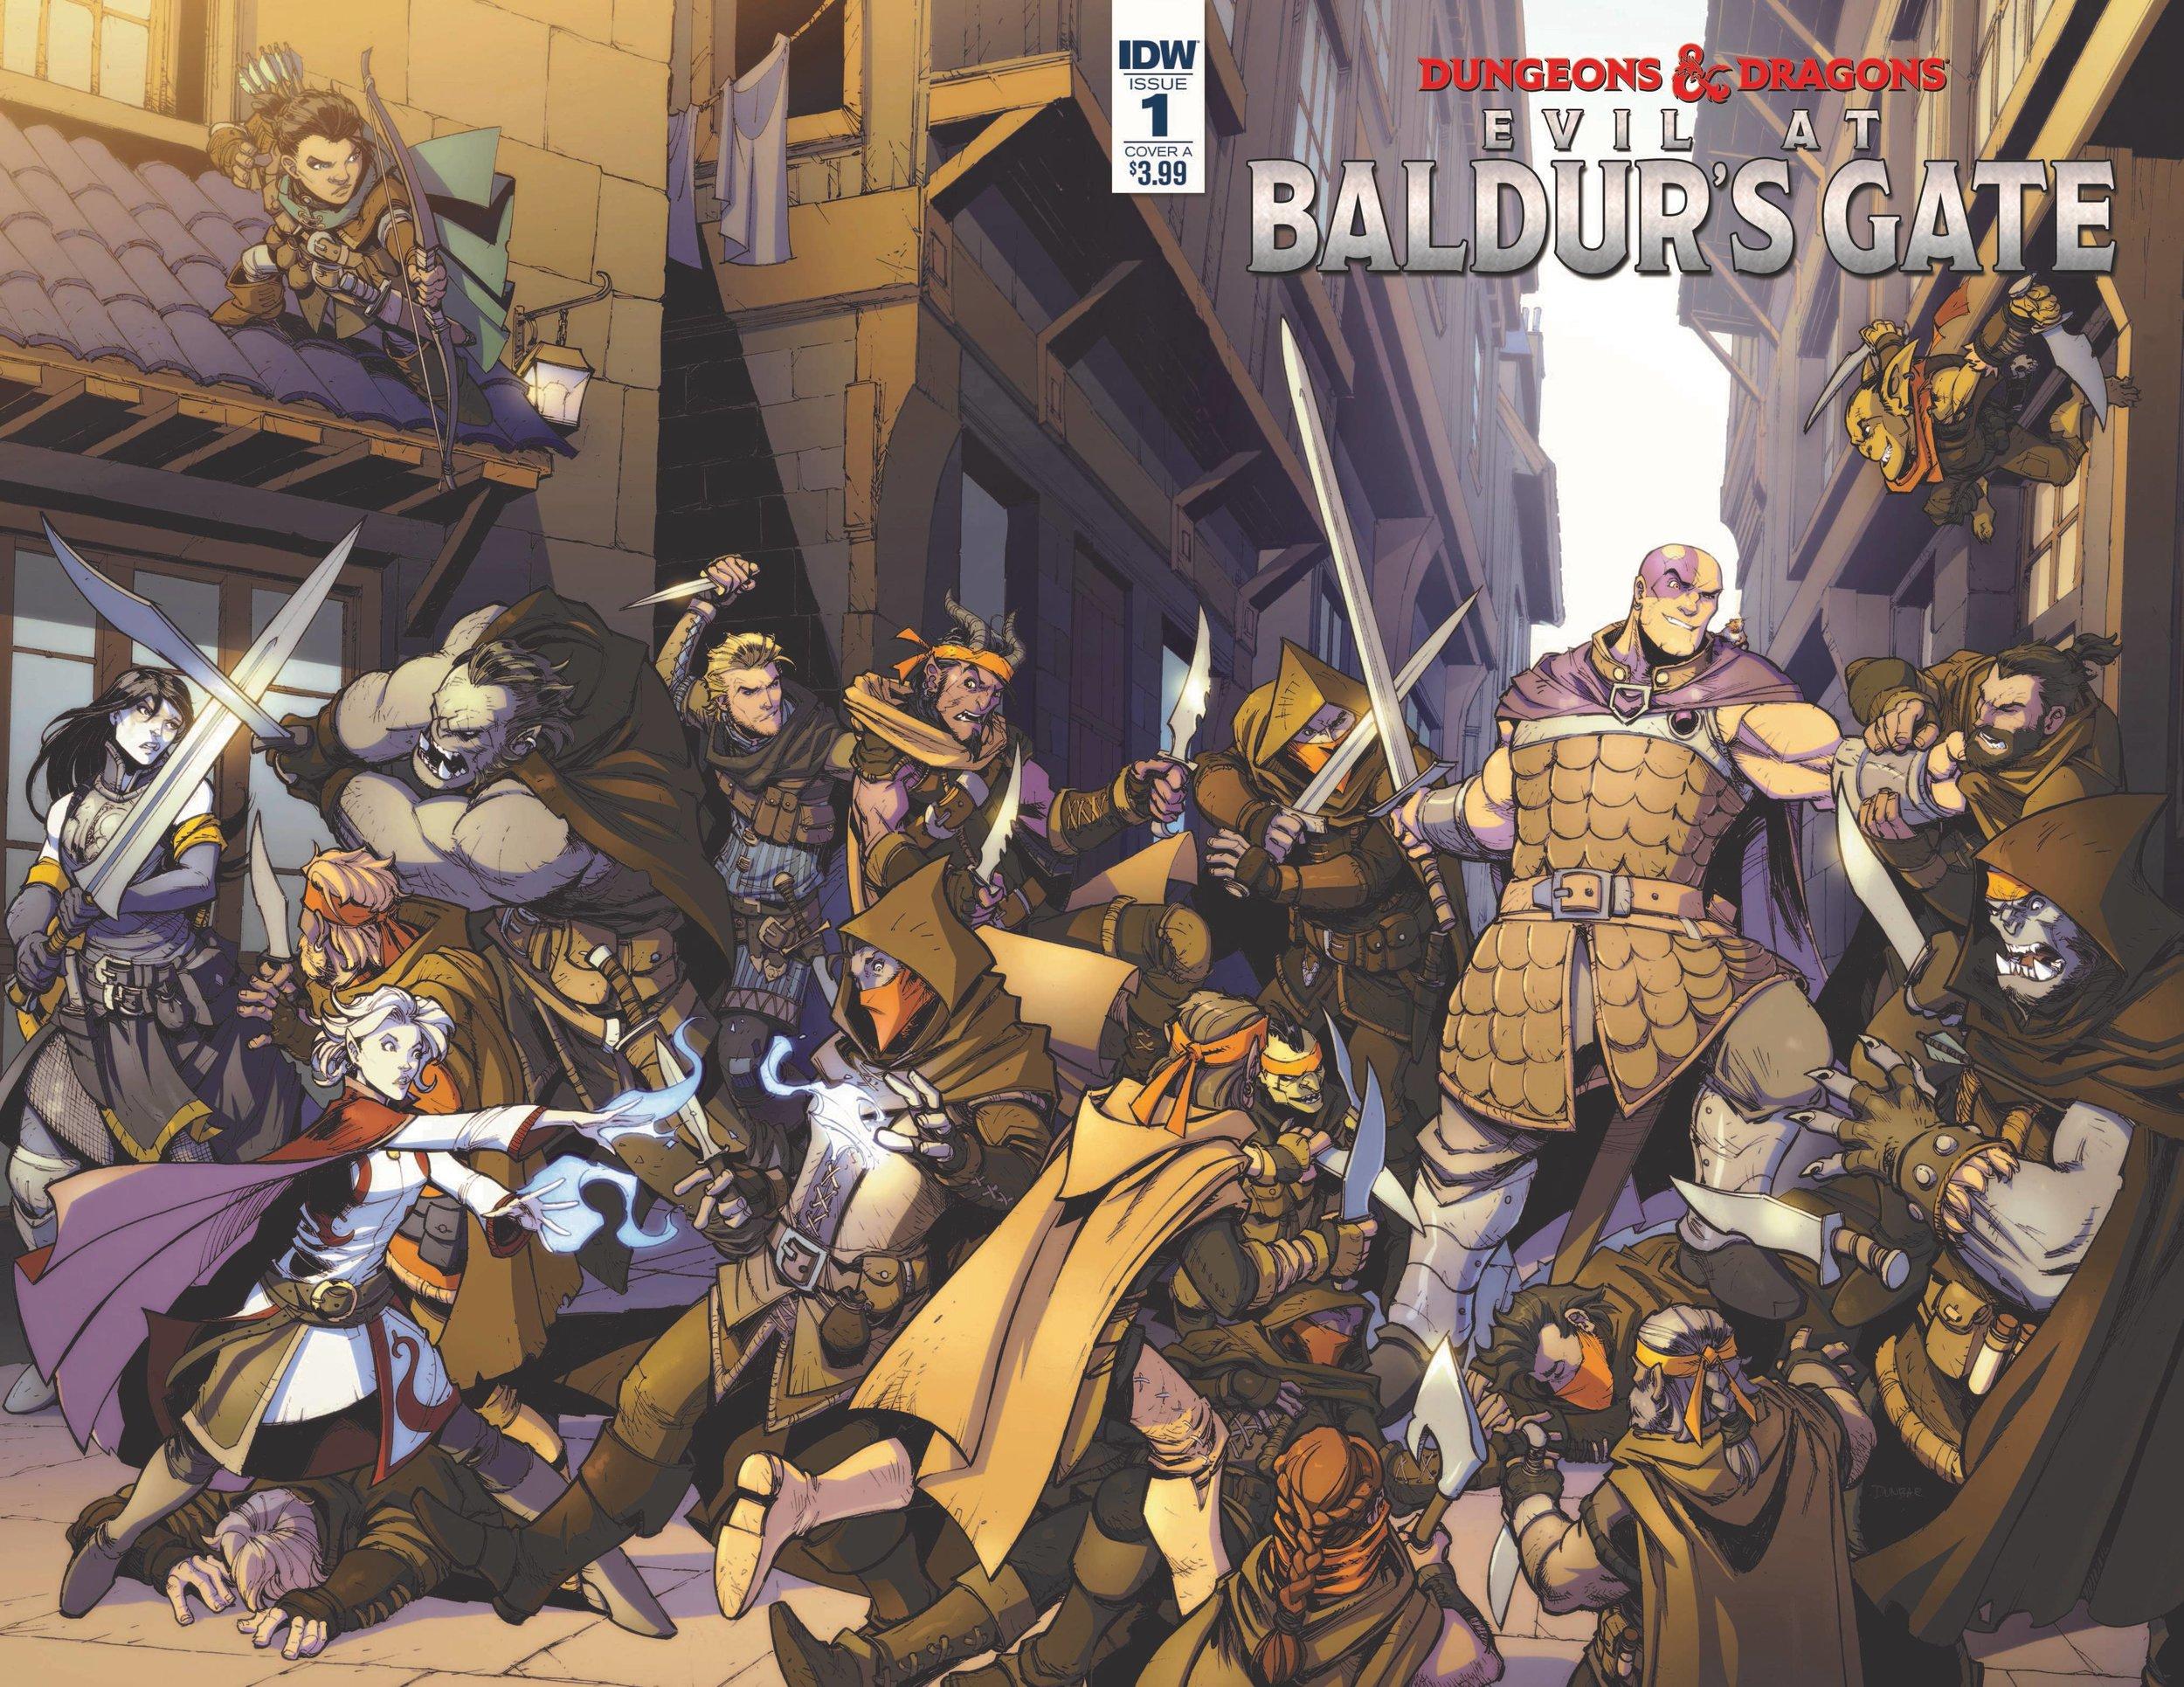 DUNGEONS & DRAGONS EVIL AT BALDURS GATE #1